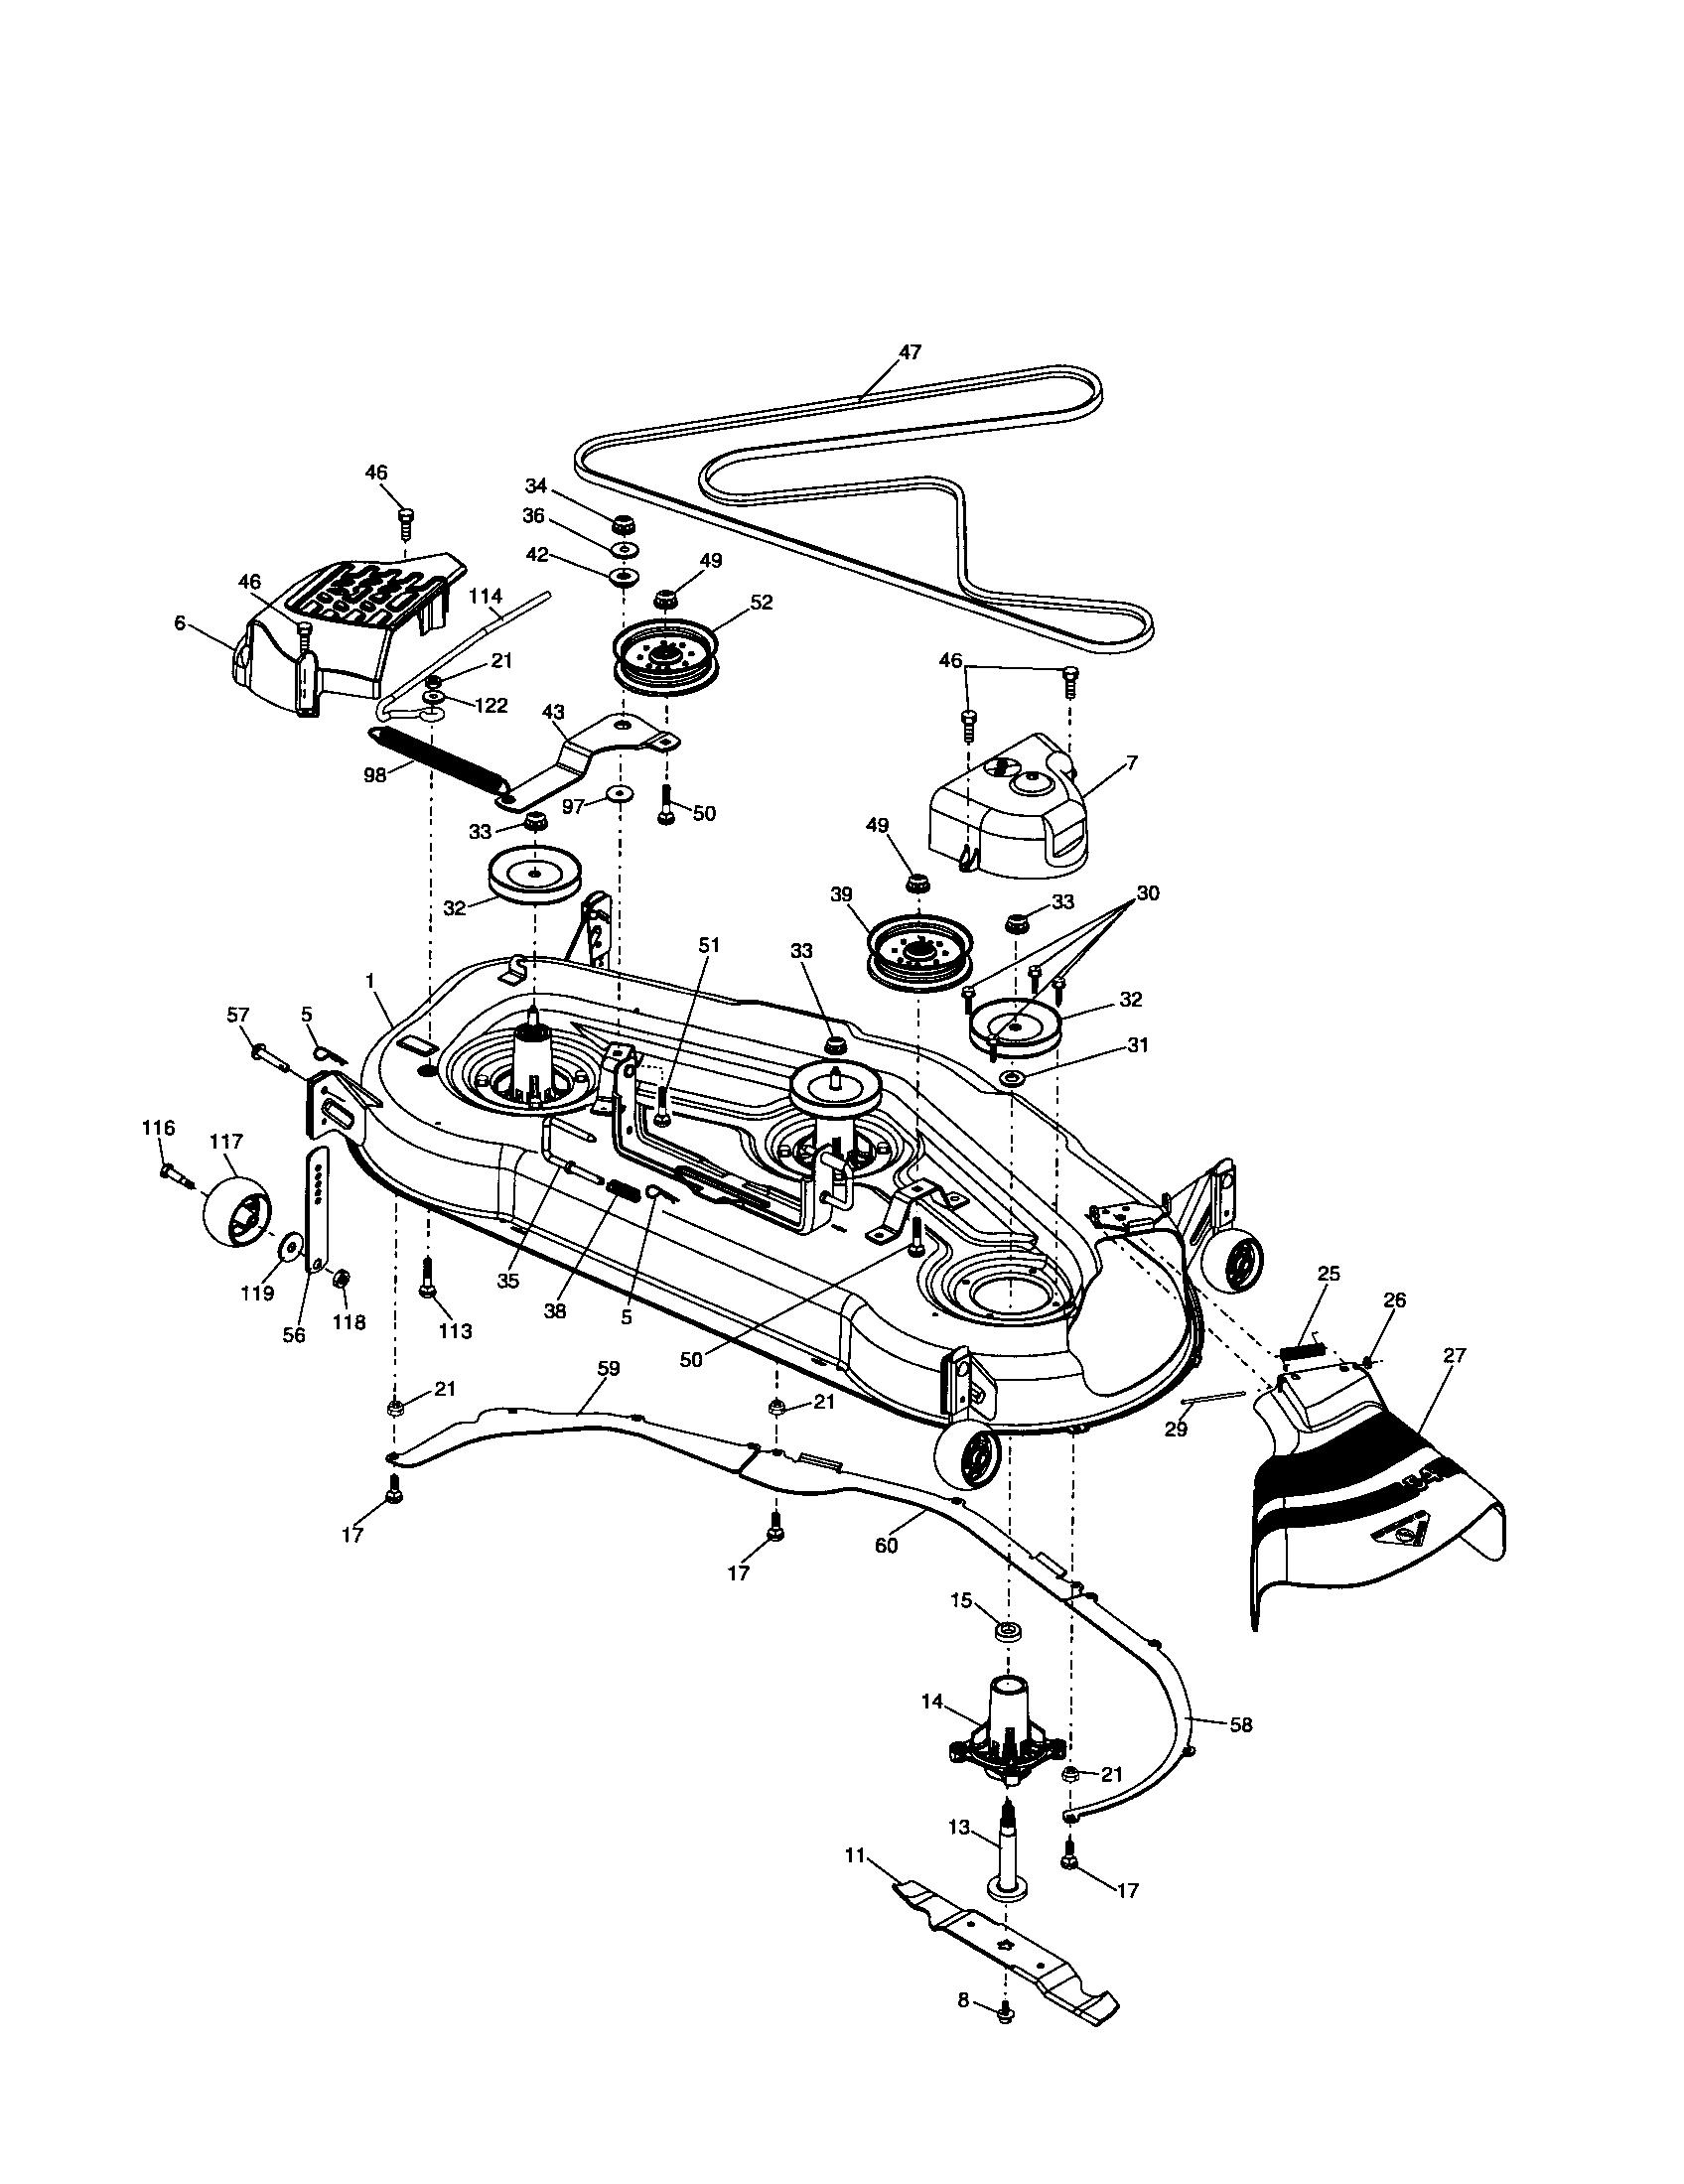 Craftsman Model 917 Wiring Diagram 271832 Schematic Diagrams Sears Mower